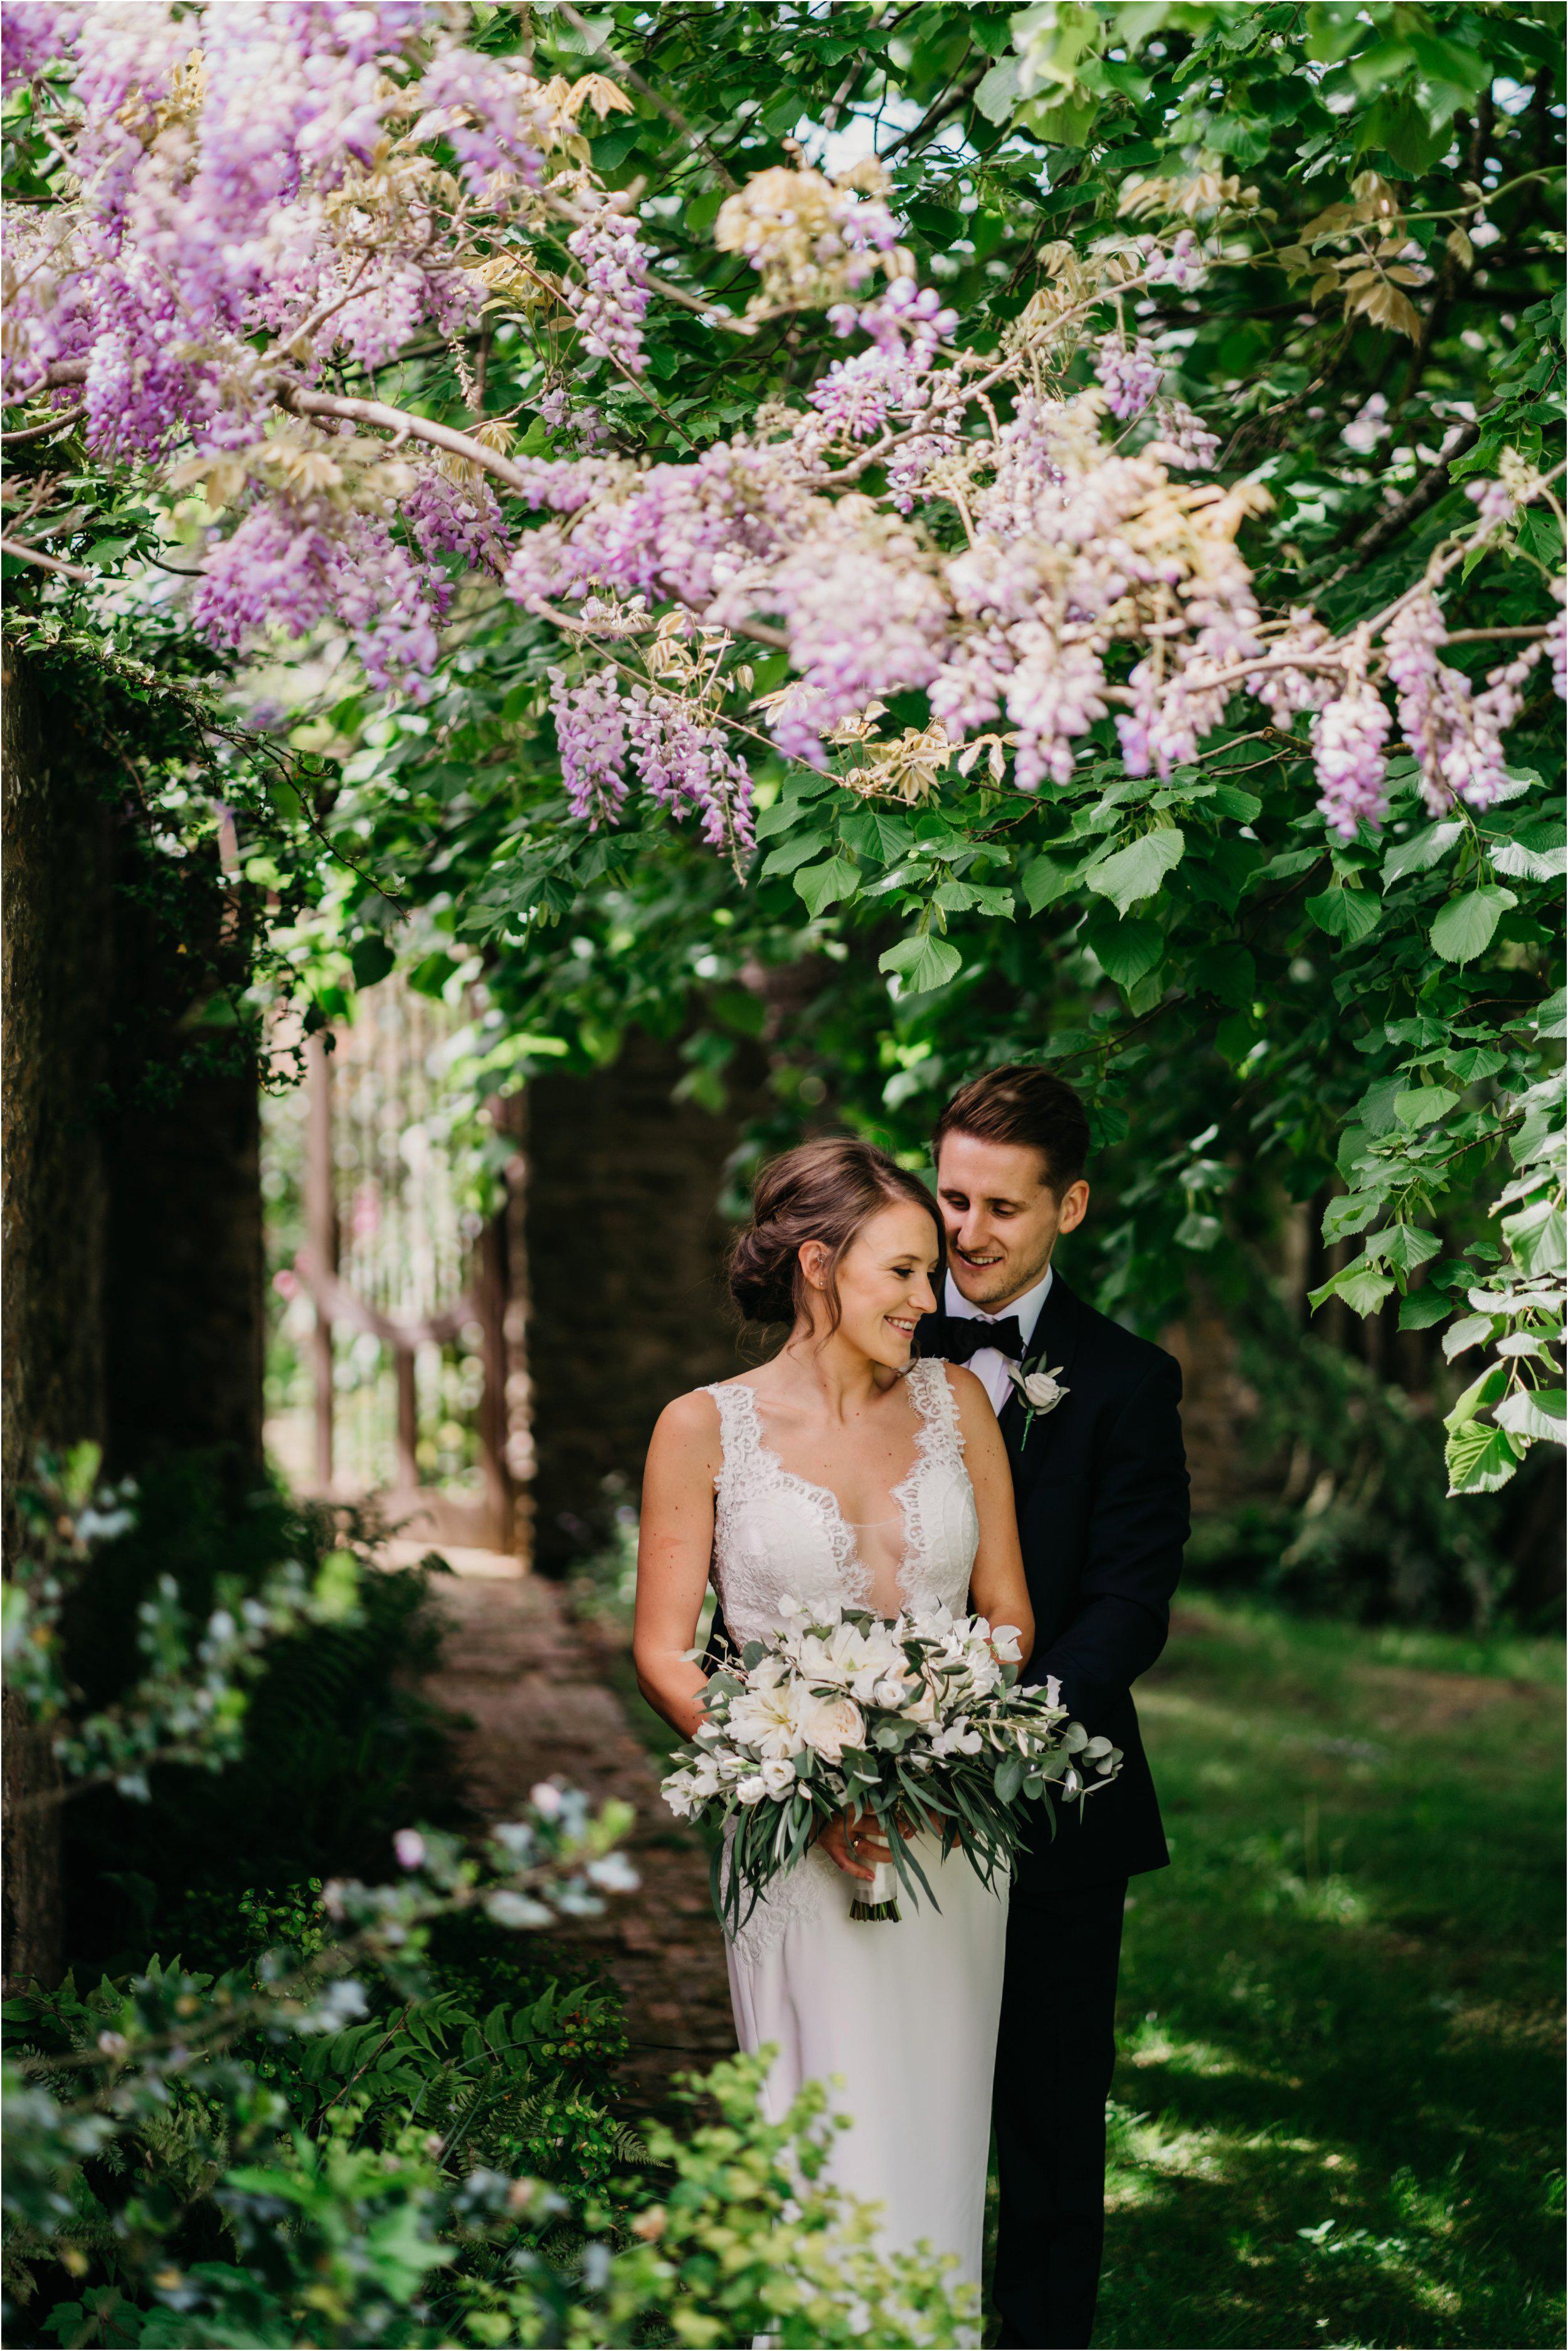 Dewsall Court Herefordshire wedding photographer_0067.jpg